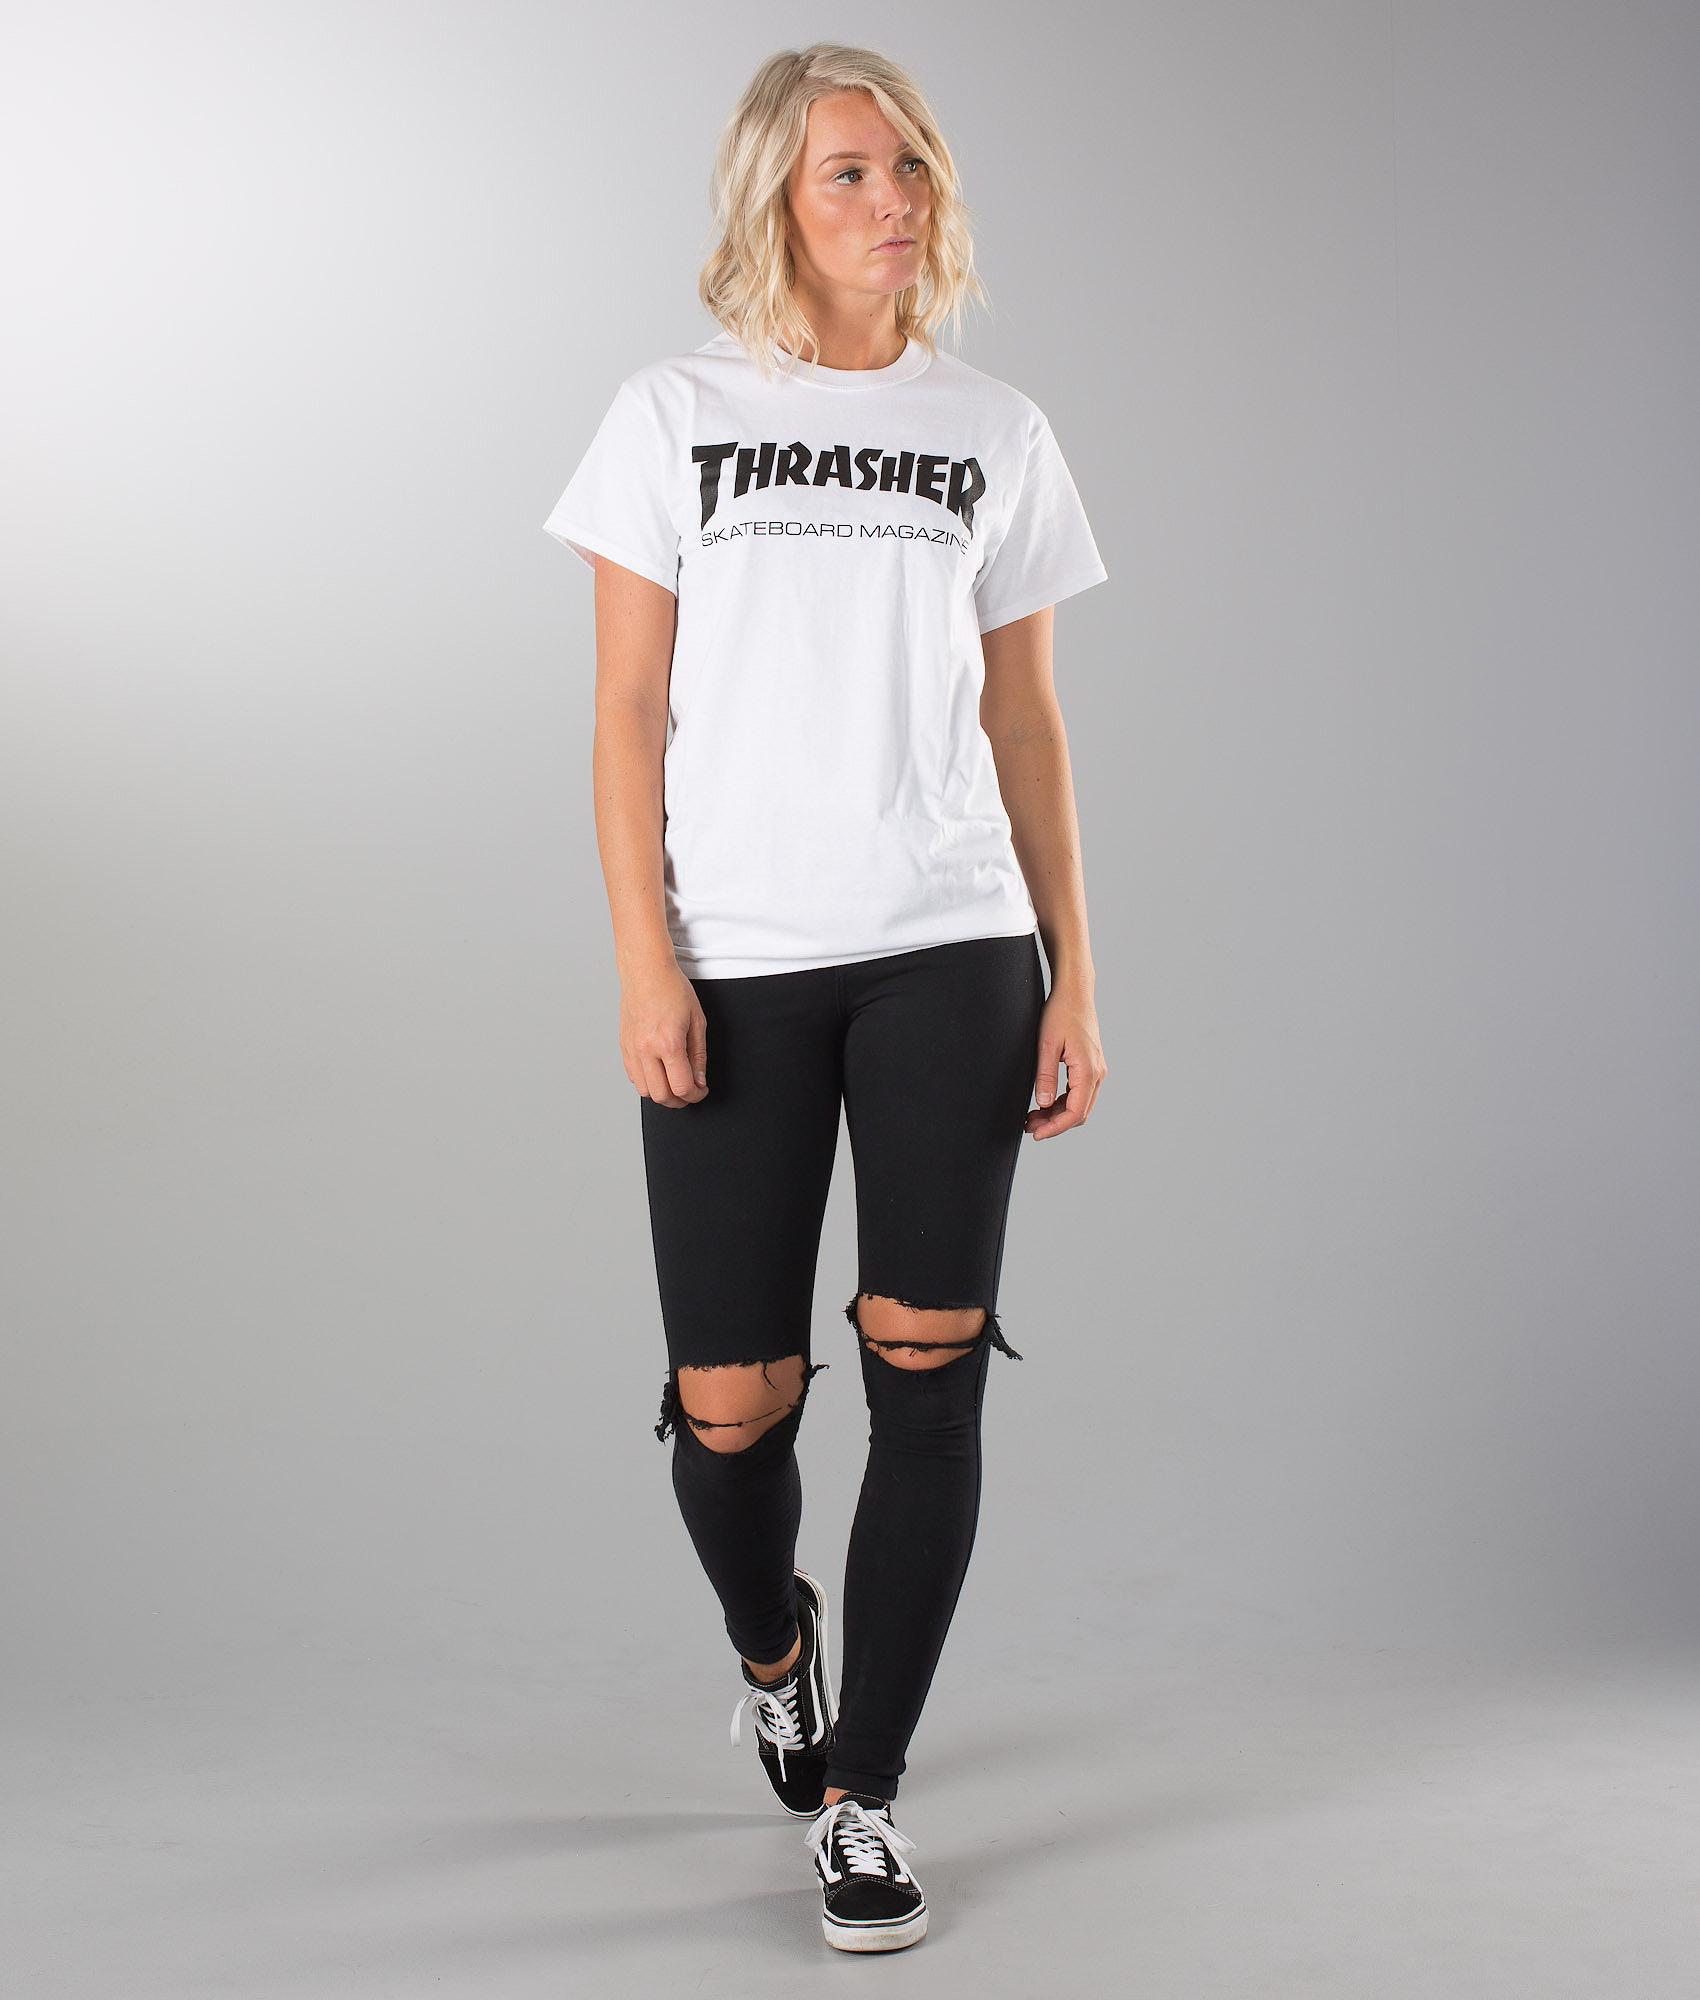 dfb08b42 Thrasher Skate Mag Unisex T-shirt White - Ridestore.com